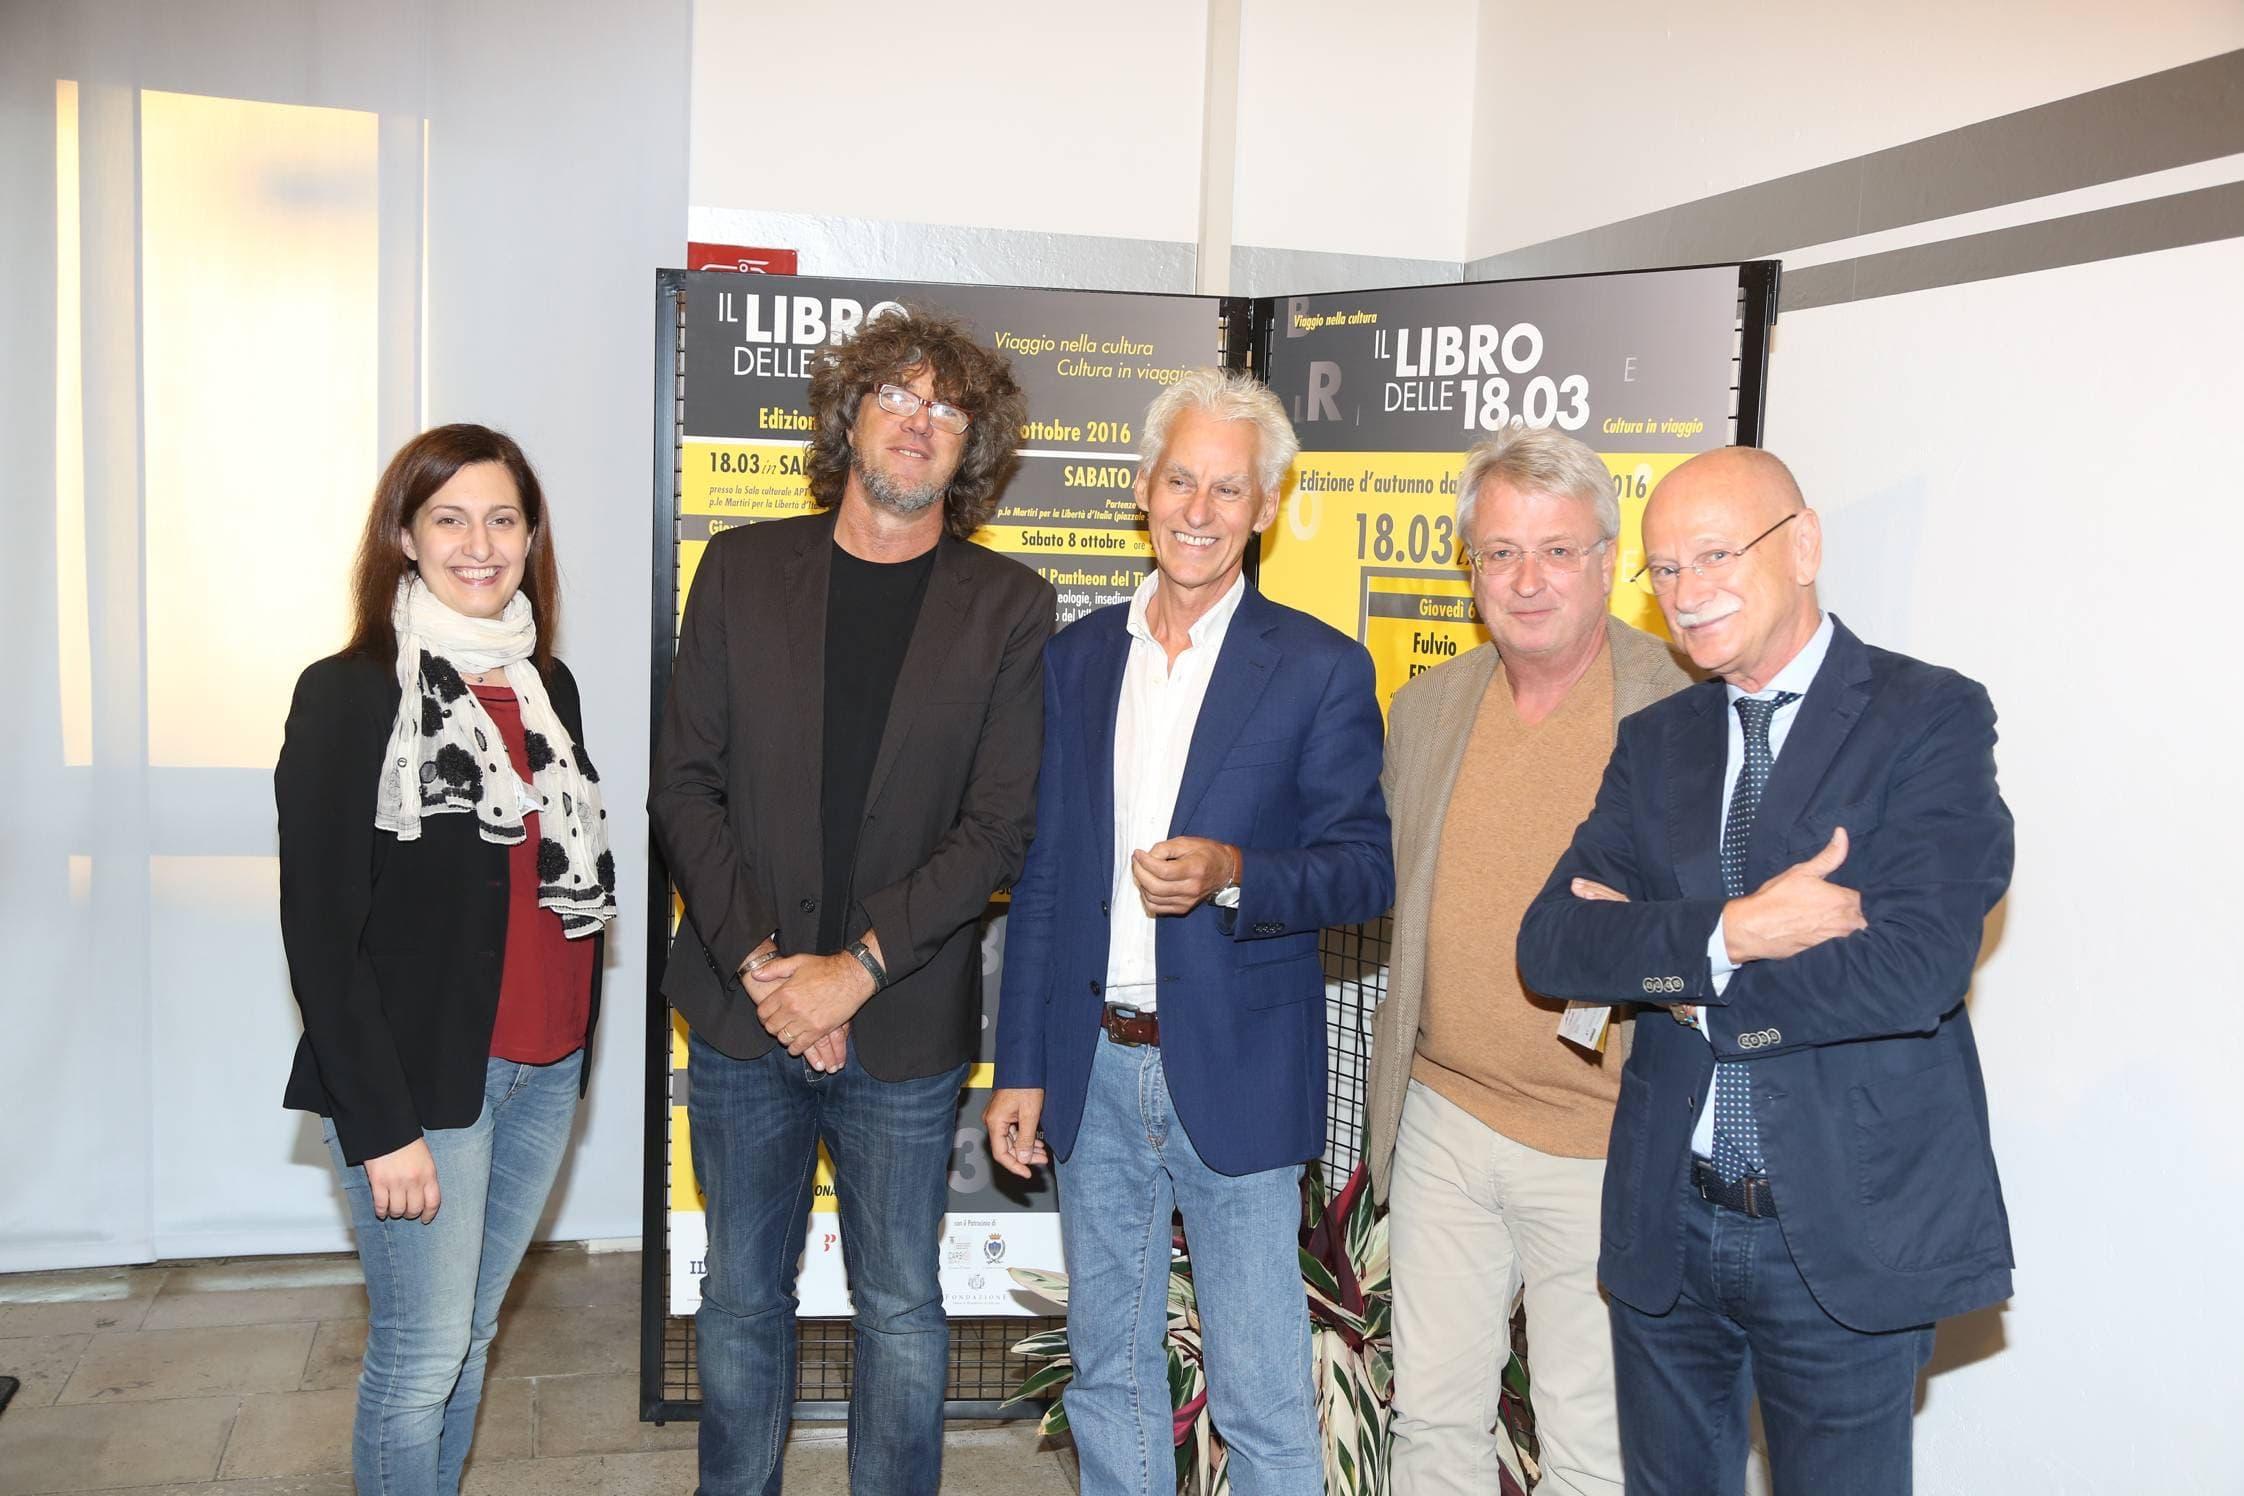 Sara Cumar, Maurizio Cataruzza, Fulvio Ervas, Paolo Polli